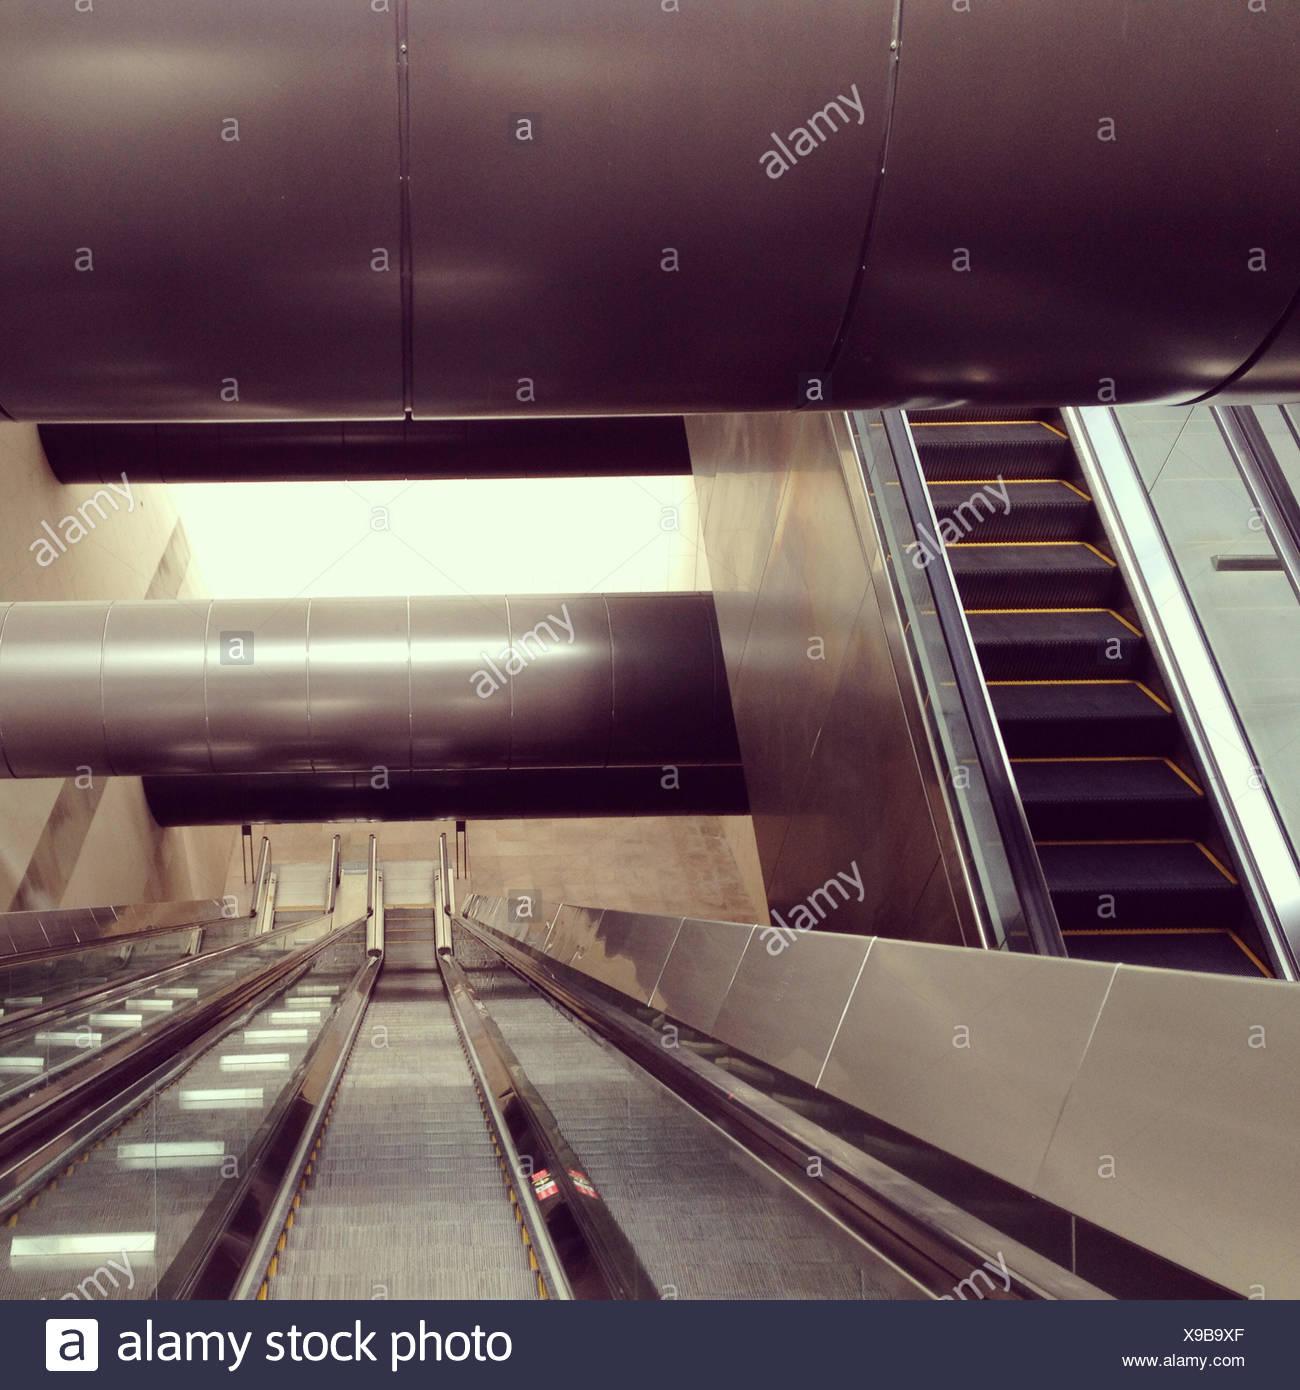 Singapore, Escalators - Stock Image